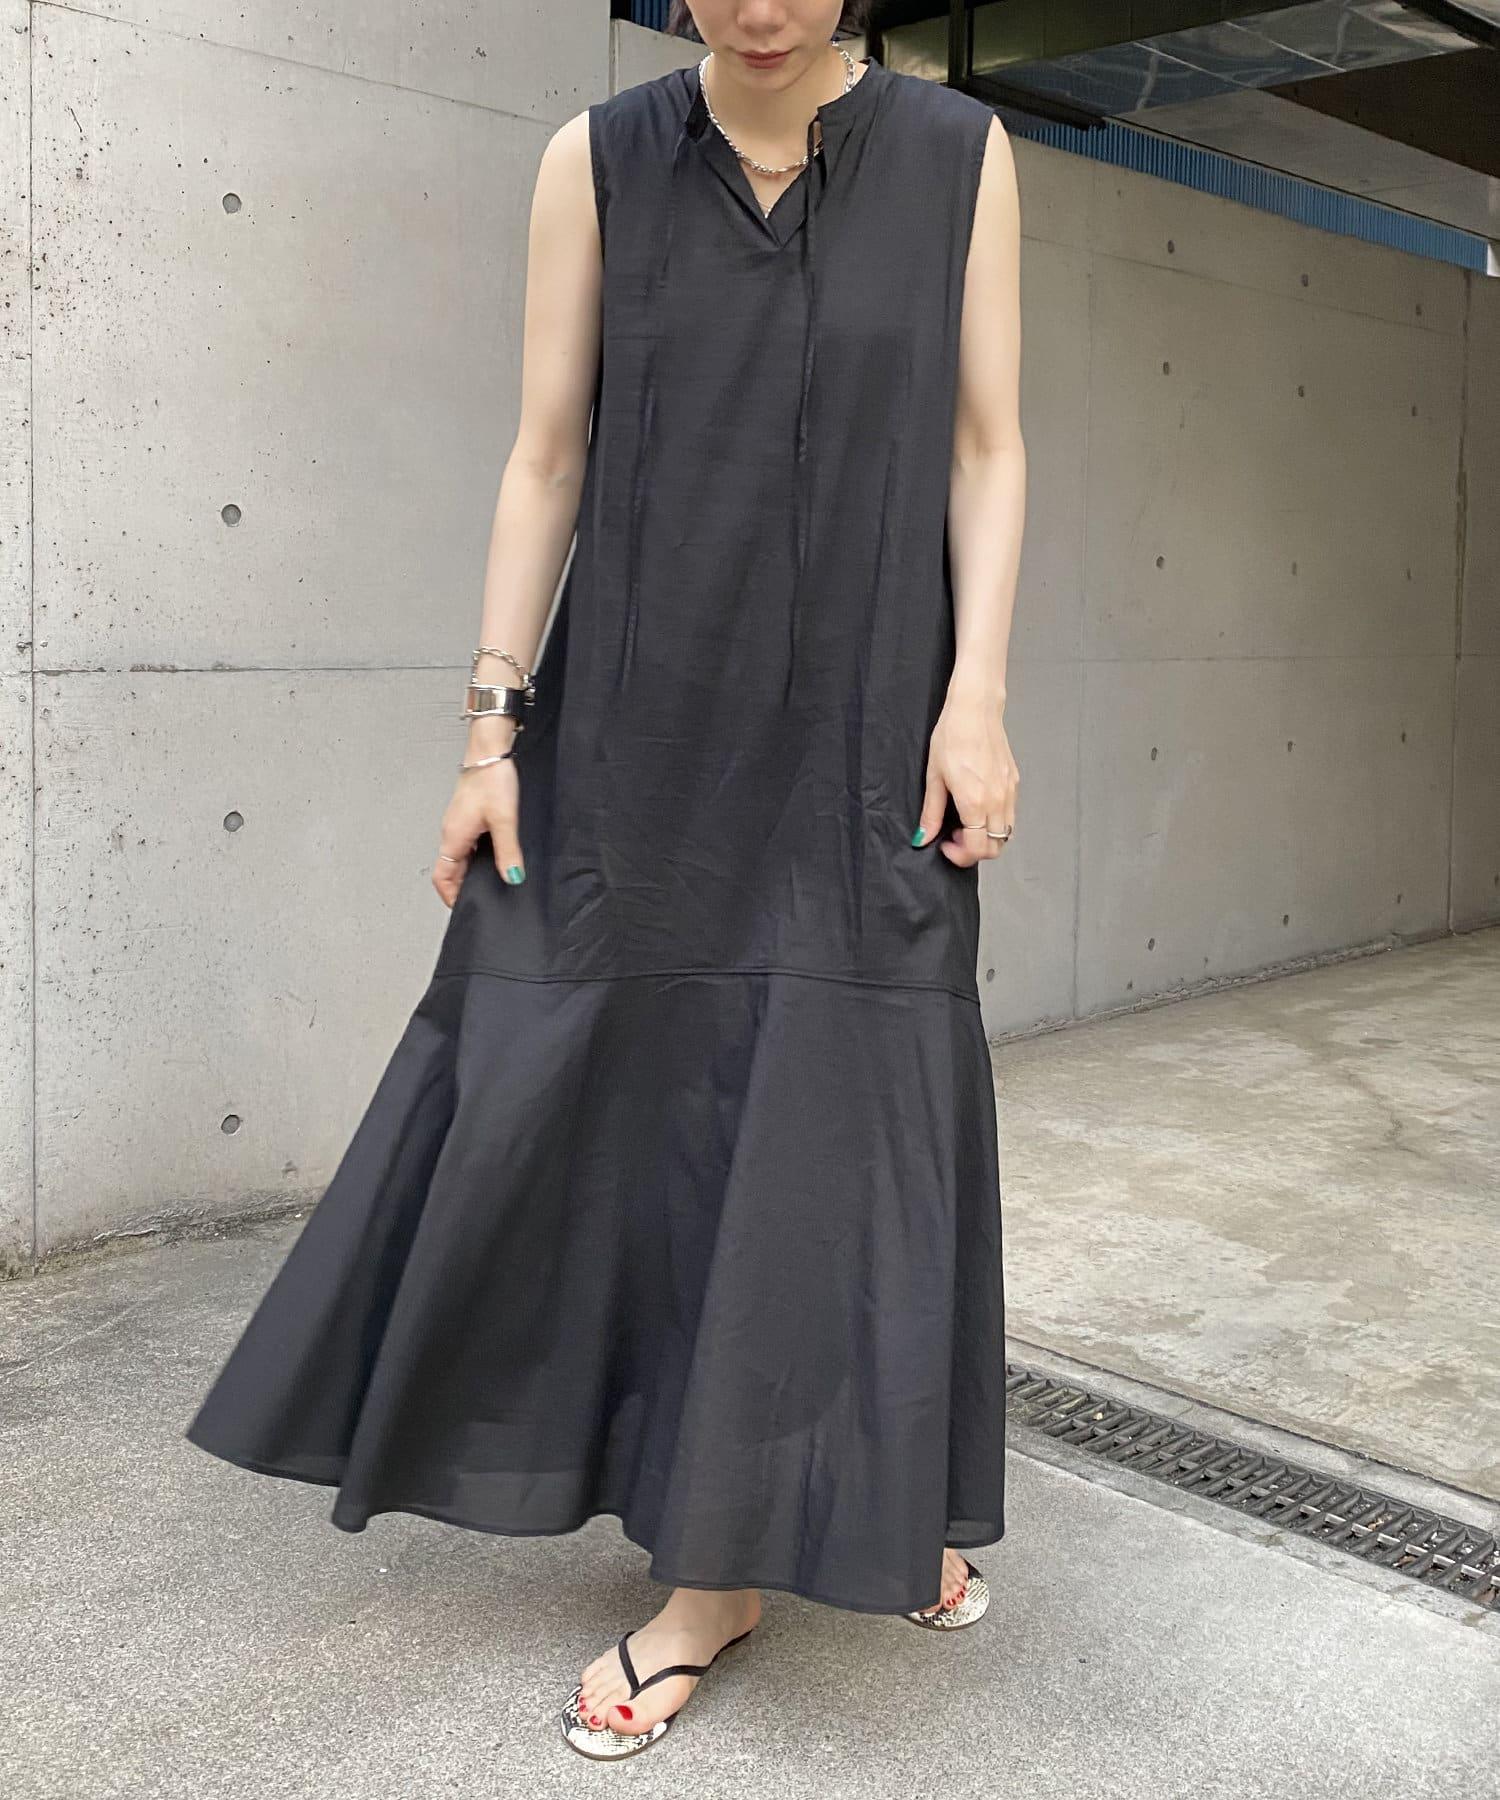 DOUDOU(ドゥドゥ) 【再入荷】【WEB限定】裾フレアマキシワンピース